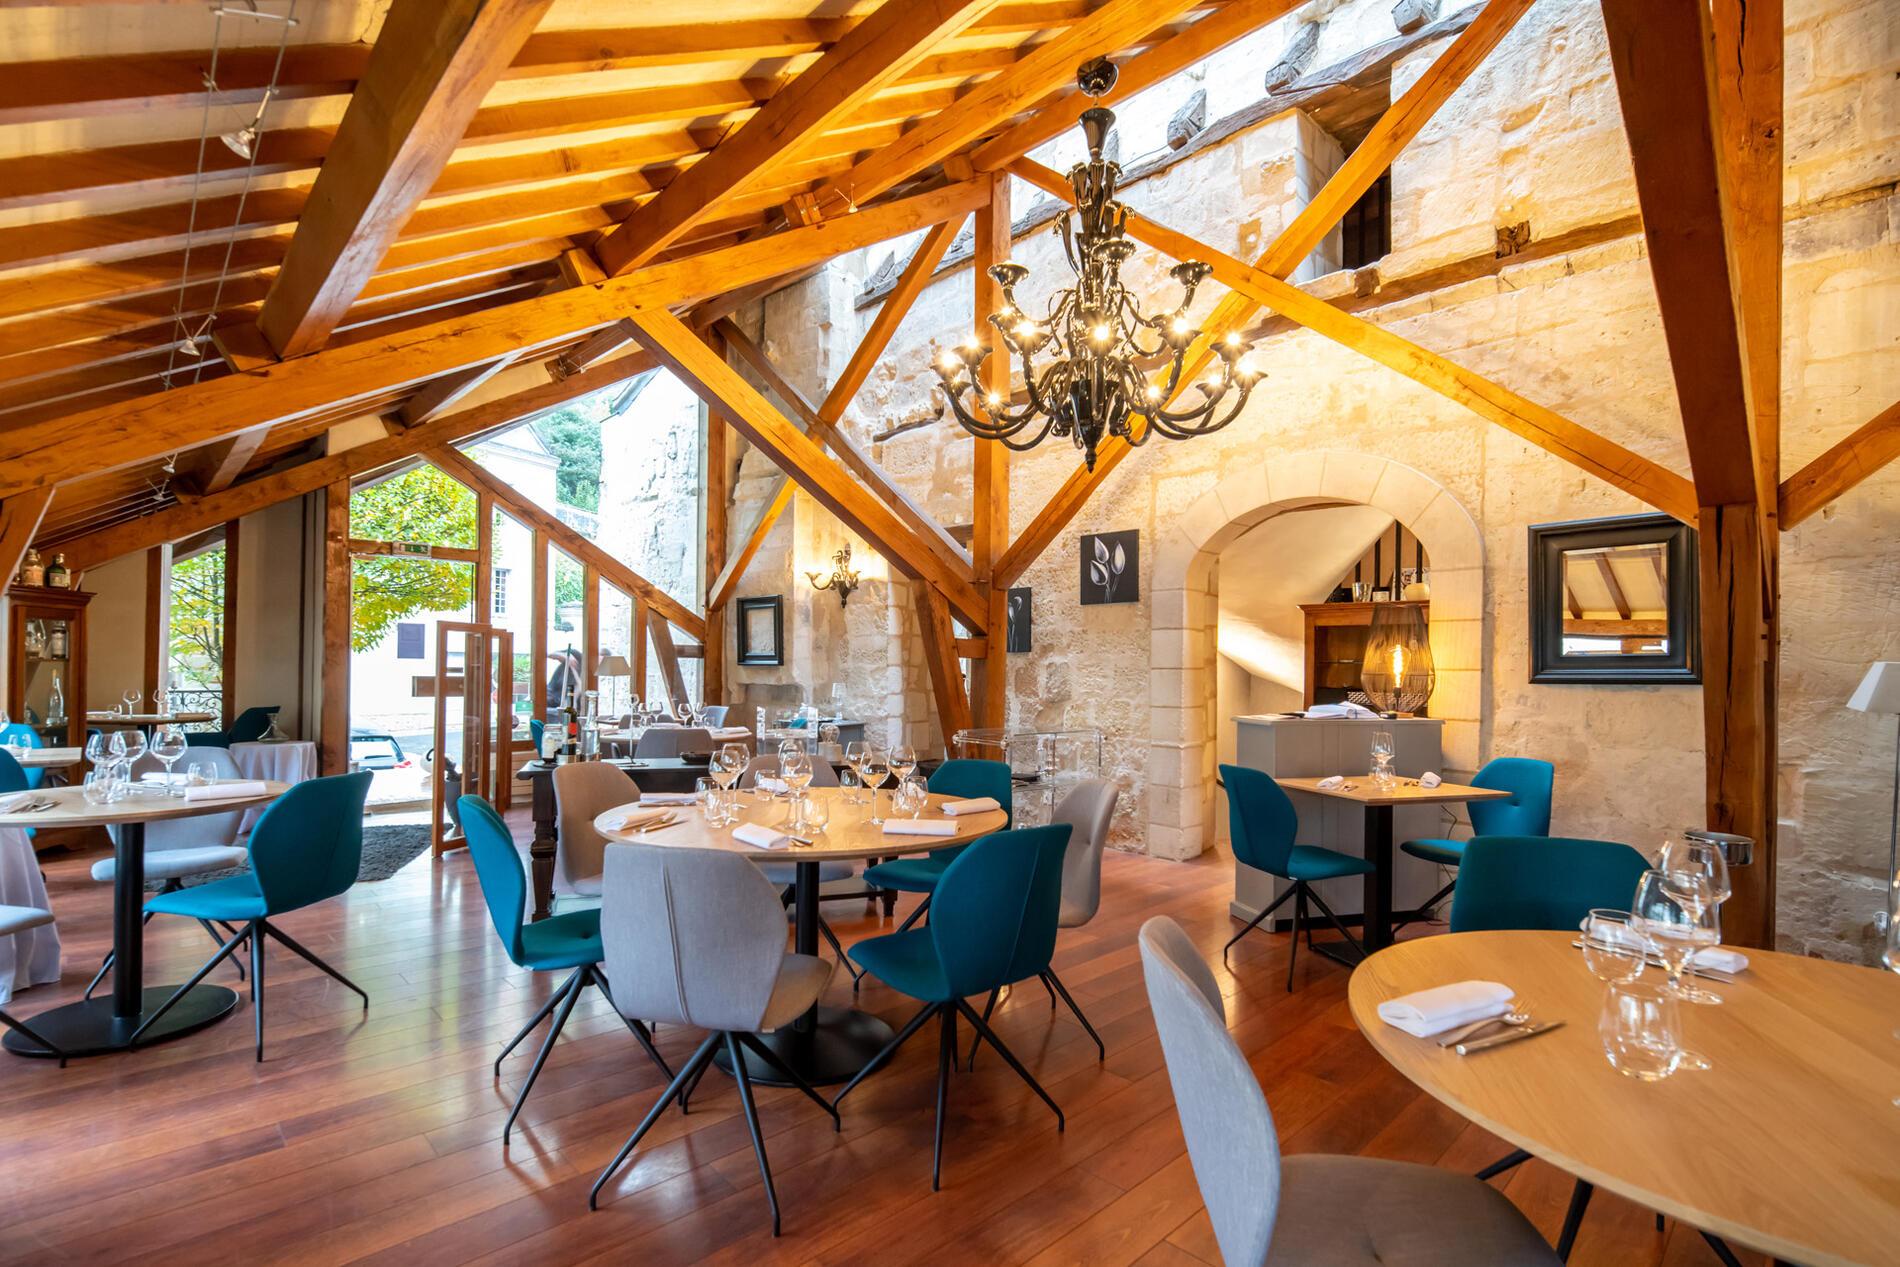 Restaurant at Hotel Anne d'Anjou in Saumur, France